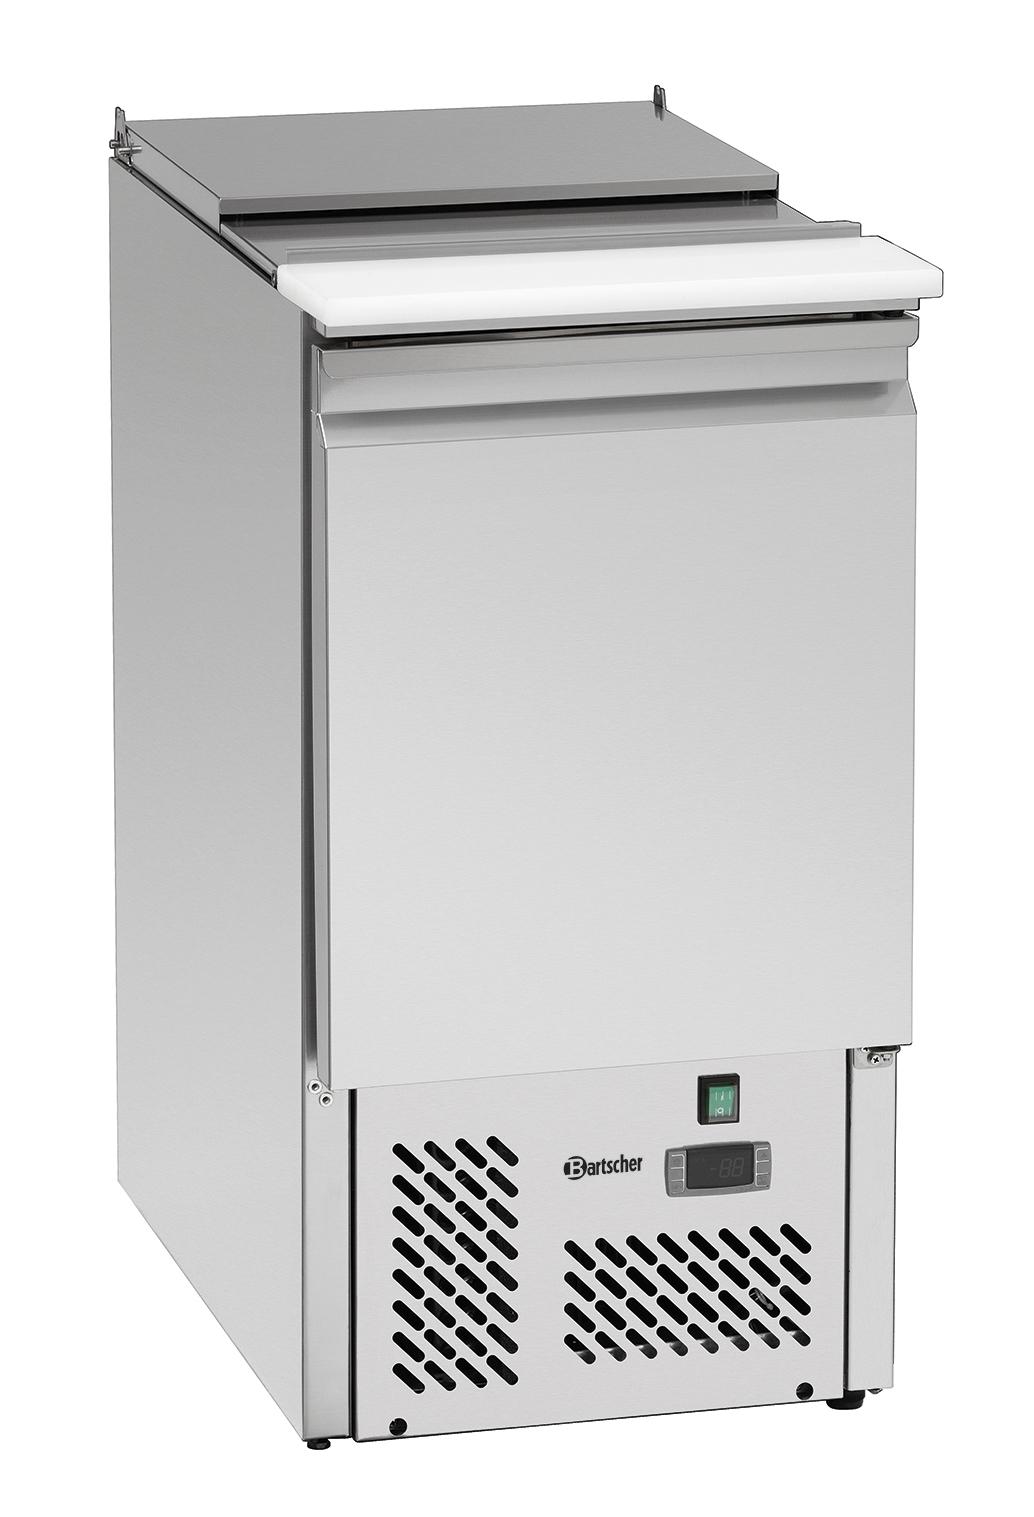 Bartscher Saladière 438T1 -1/1GN - 1DR - 140 liter - Zilver